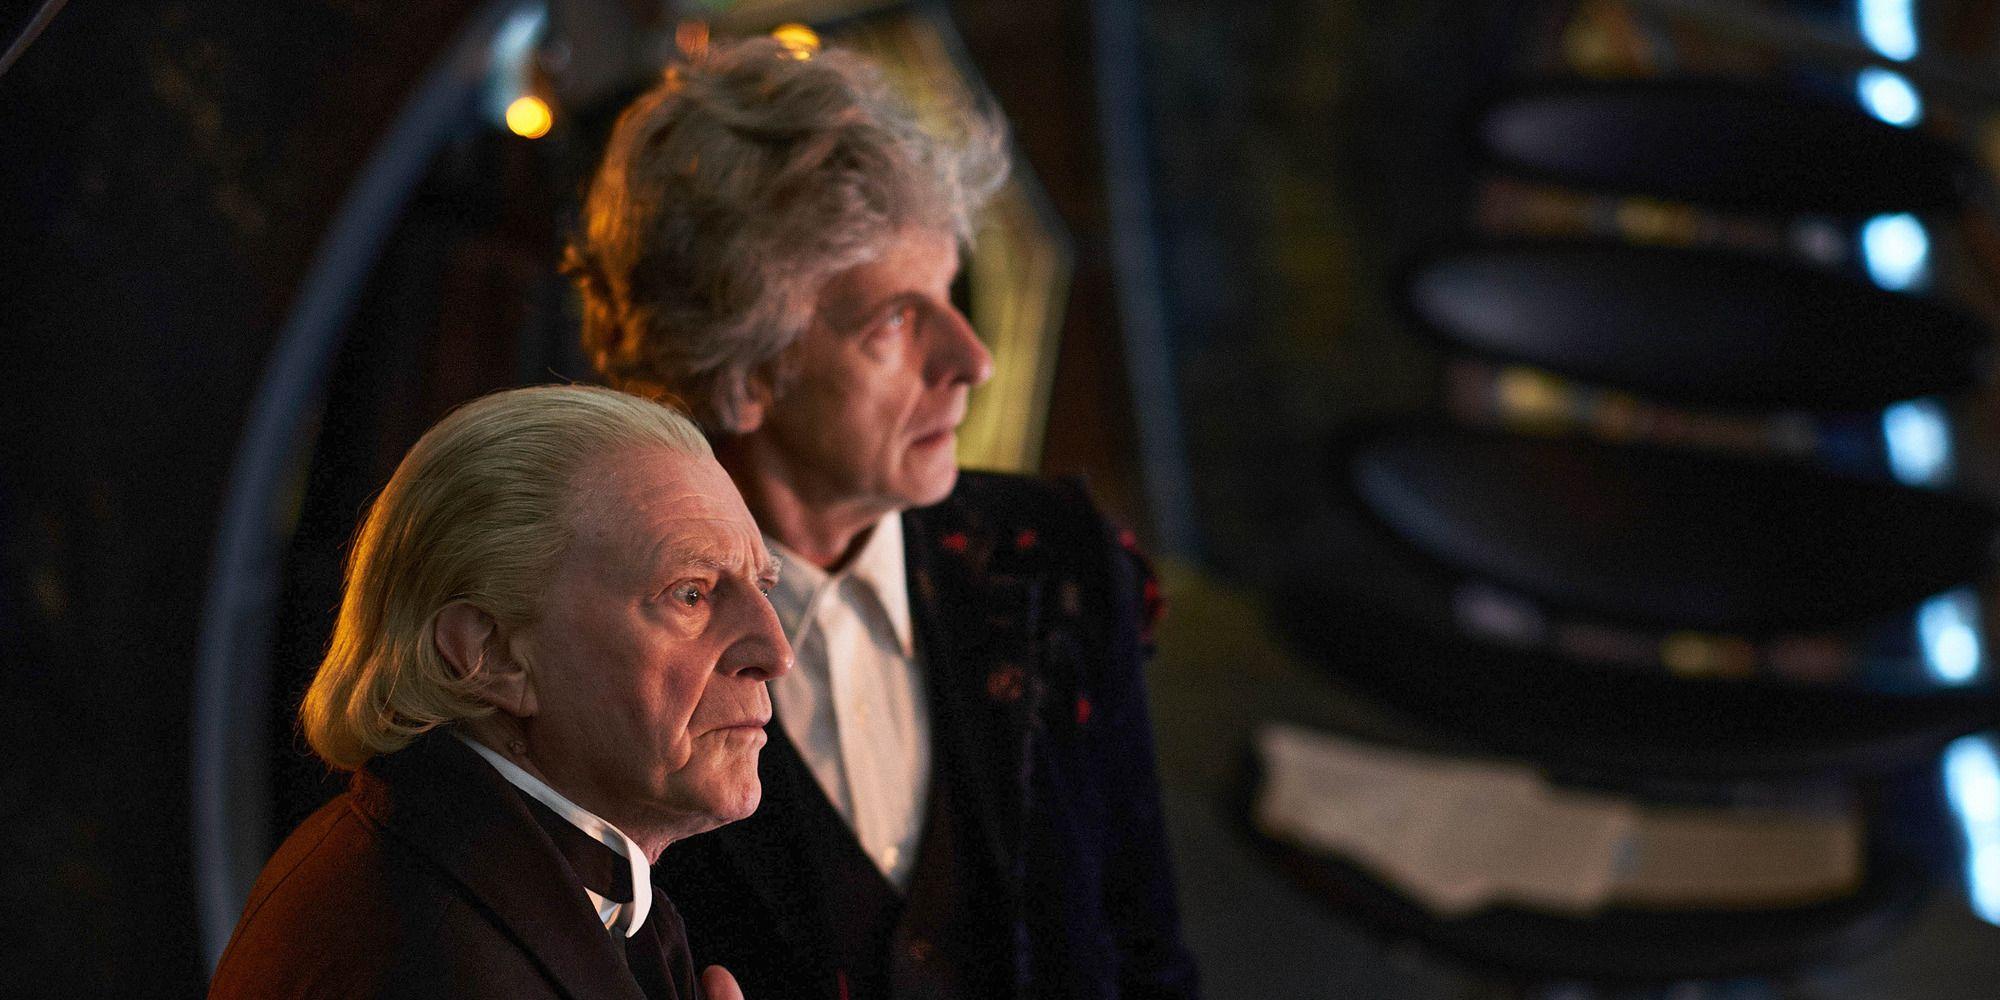 David Bradley (First Doctor), Peter Capaldi (Twelfth Doctor)